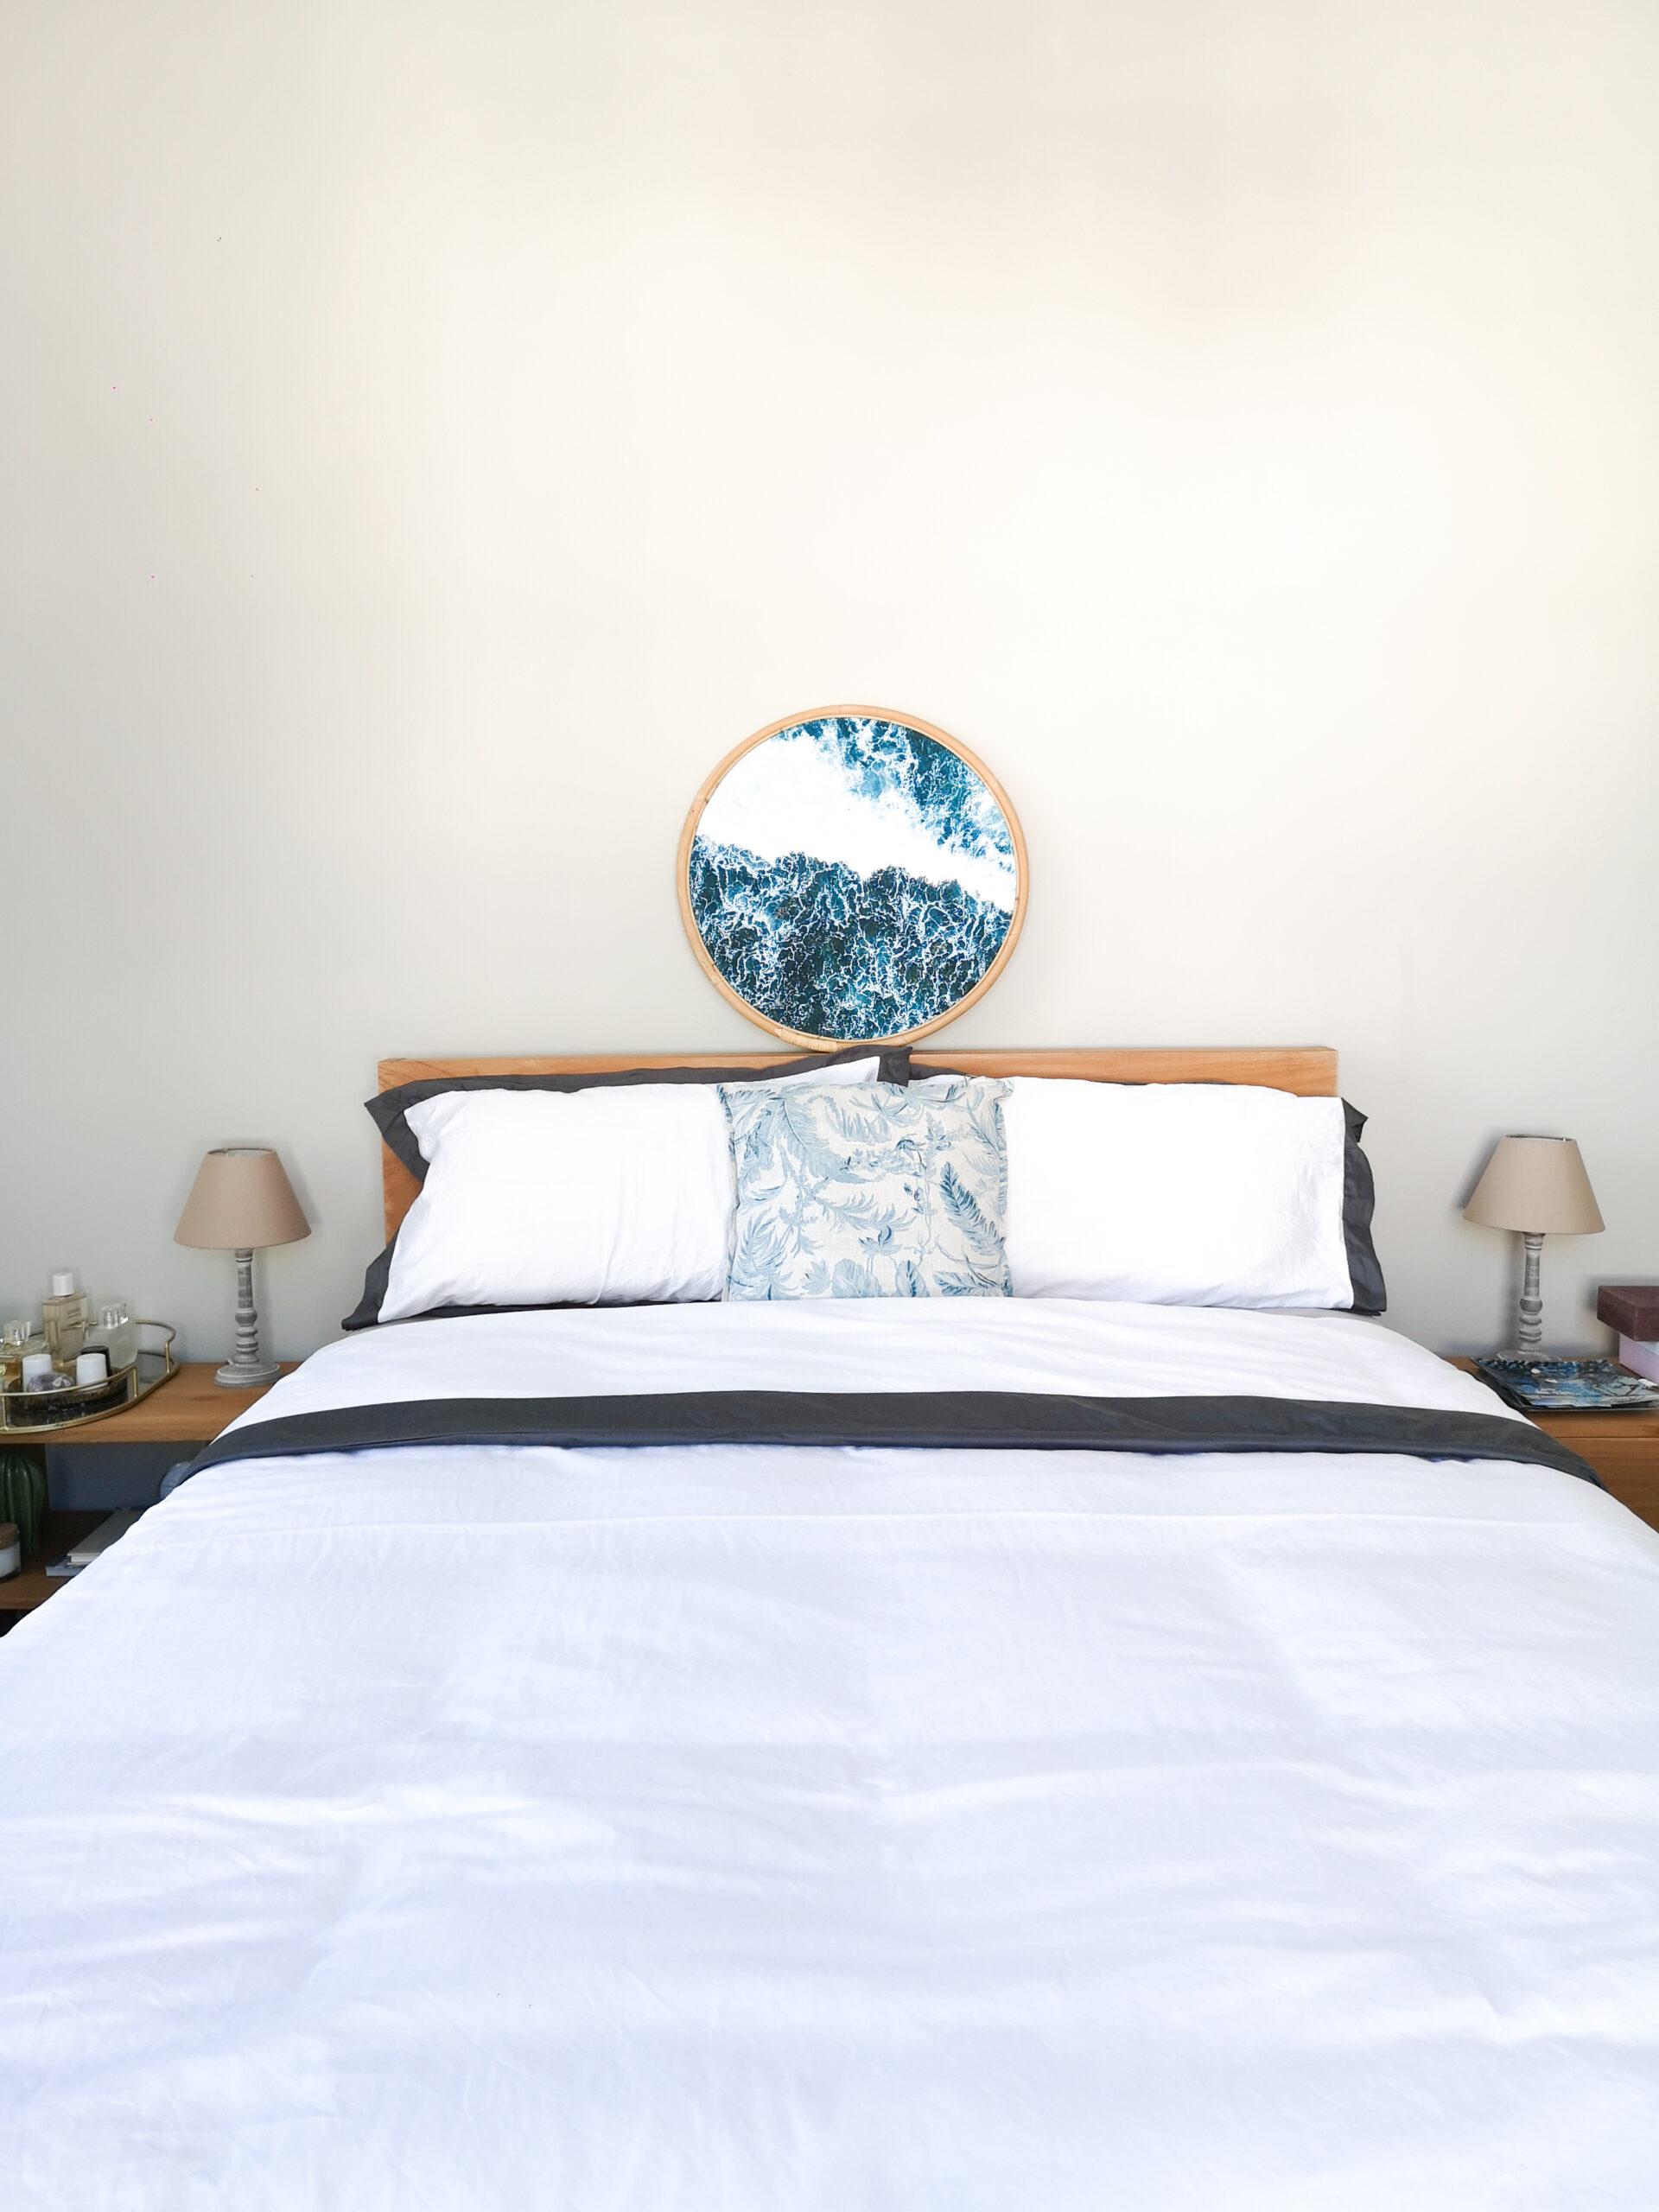 Mysa bed linen